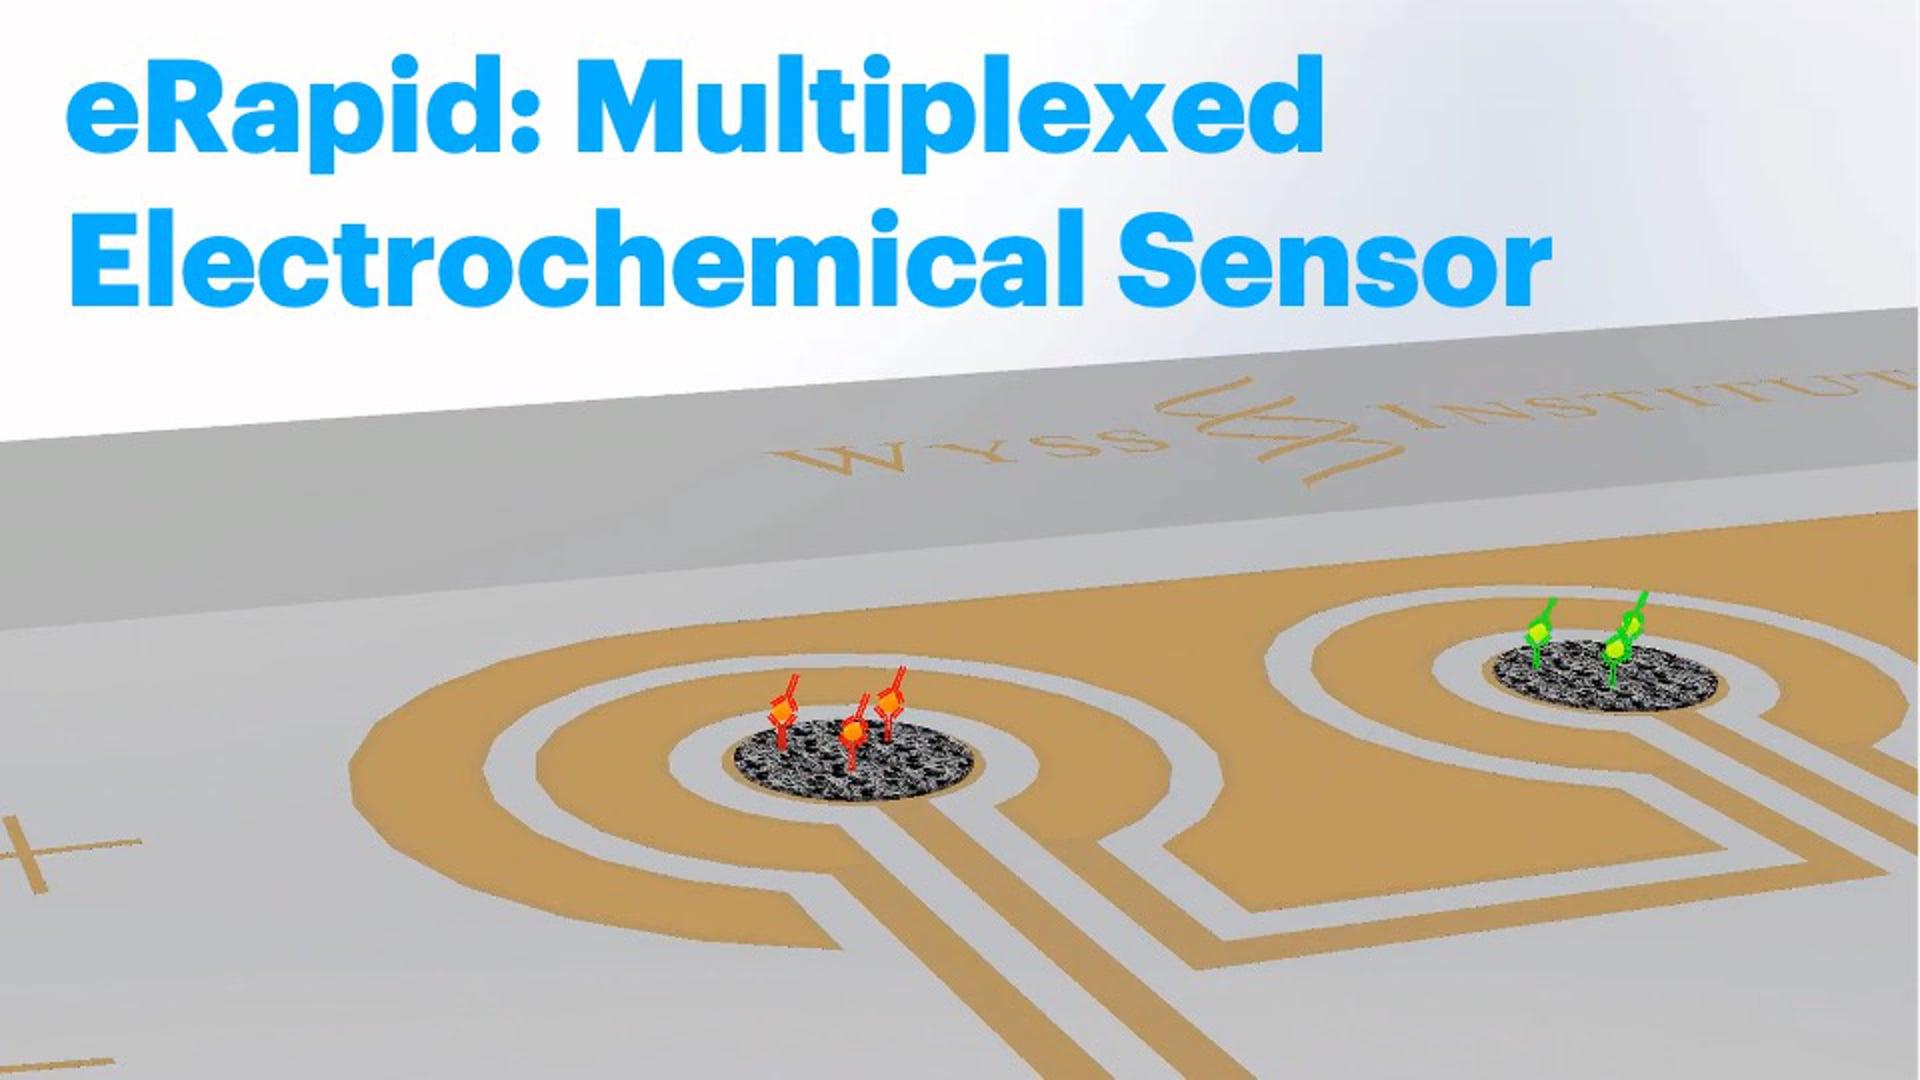 eRapid: Multiplexed Electrochemical Sensor